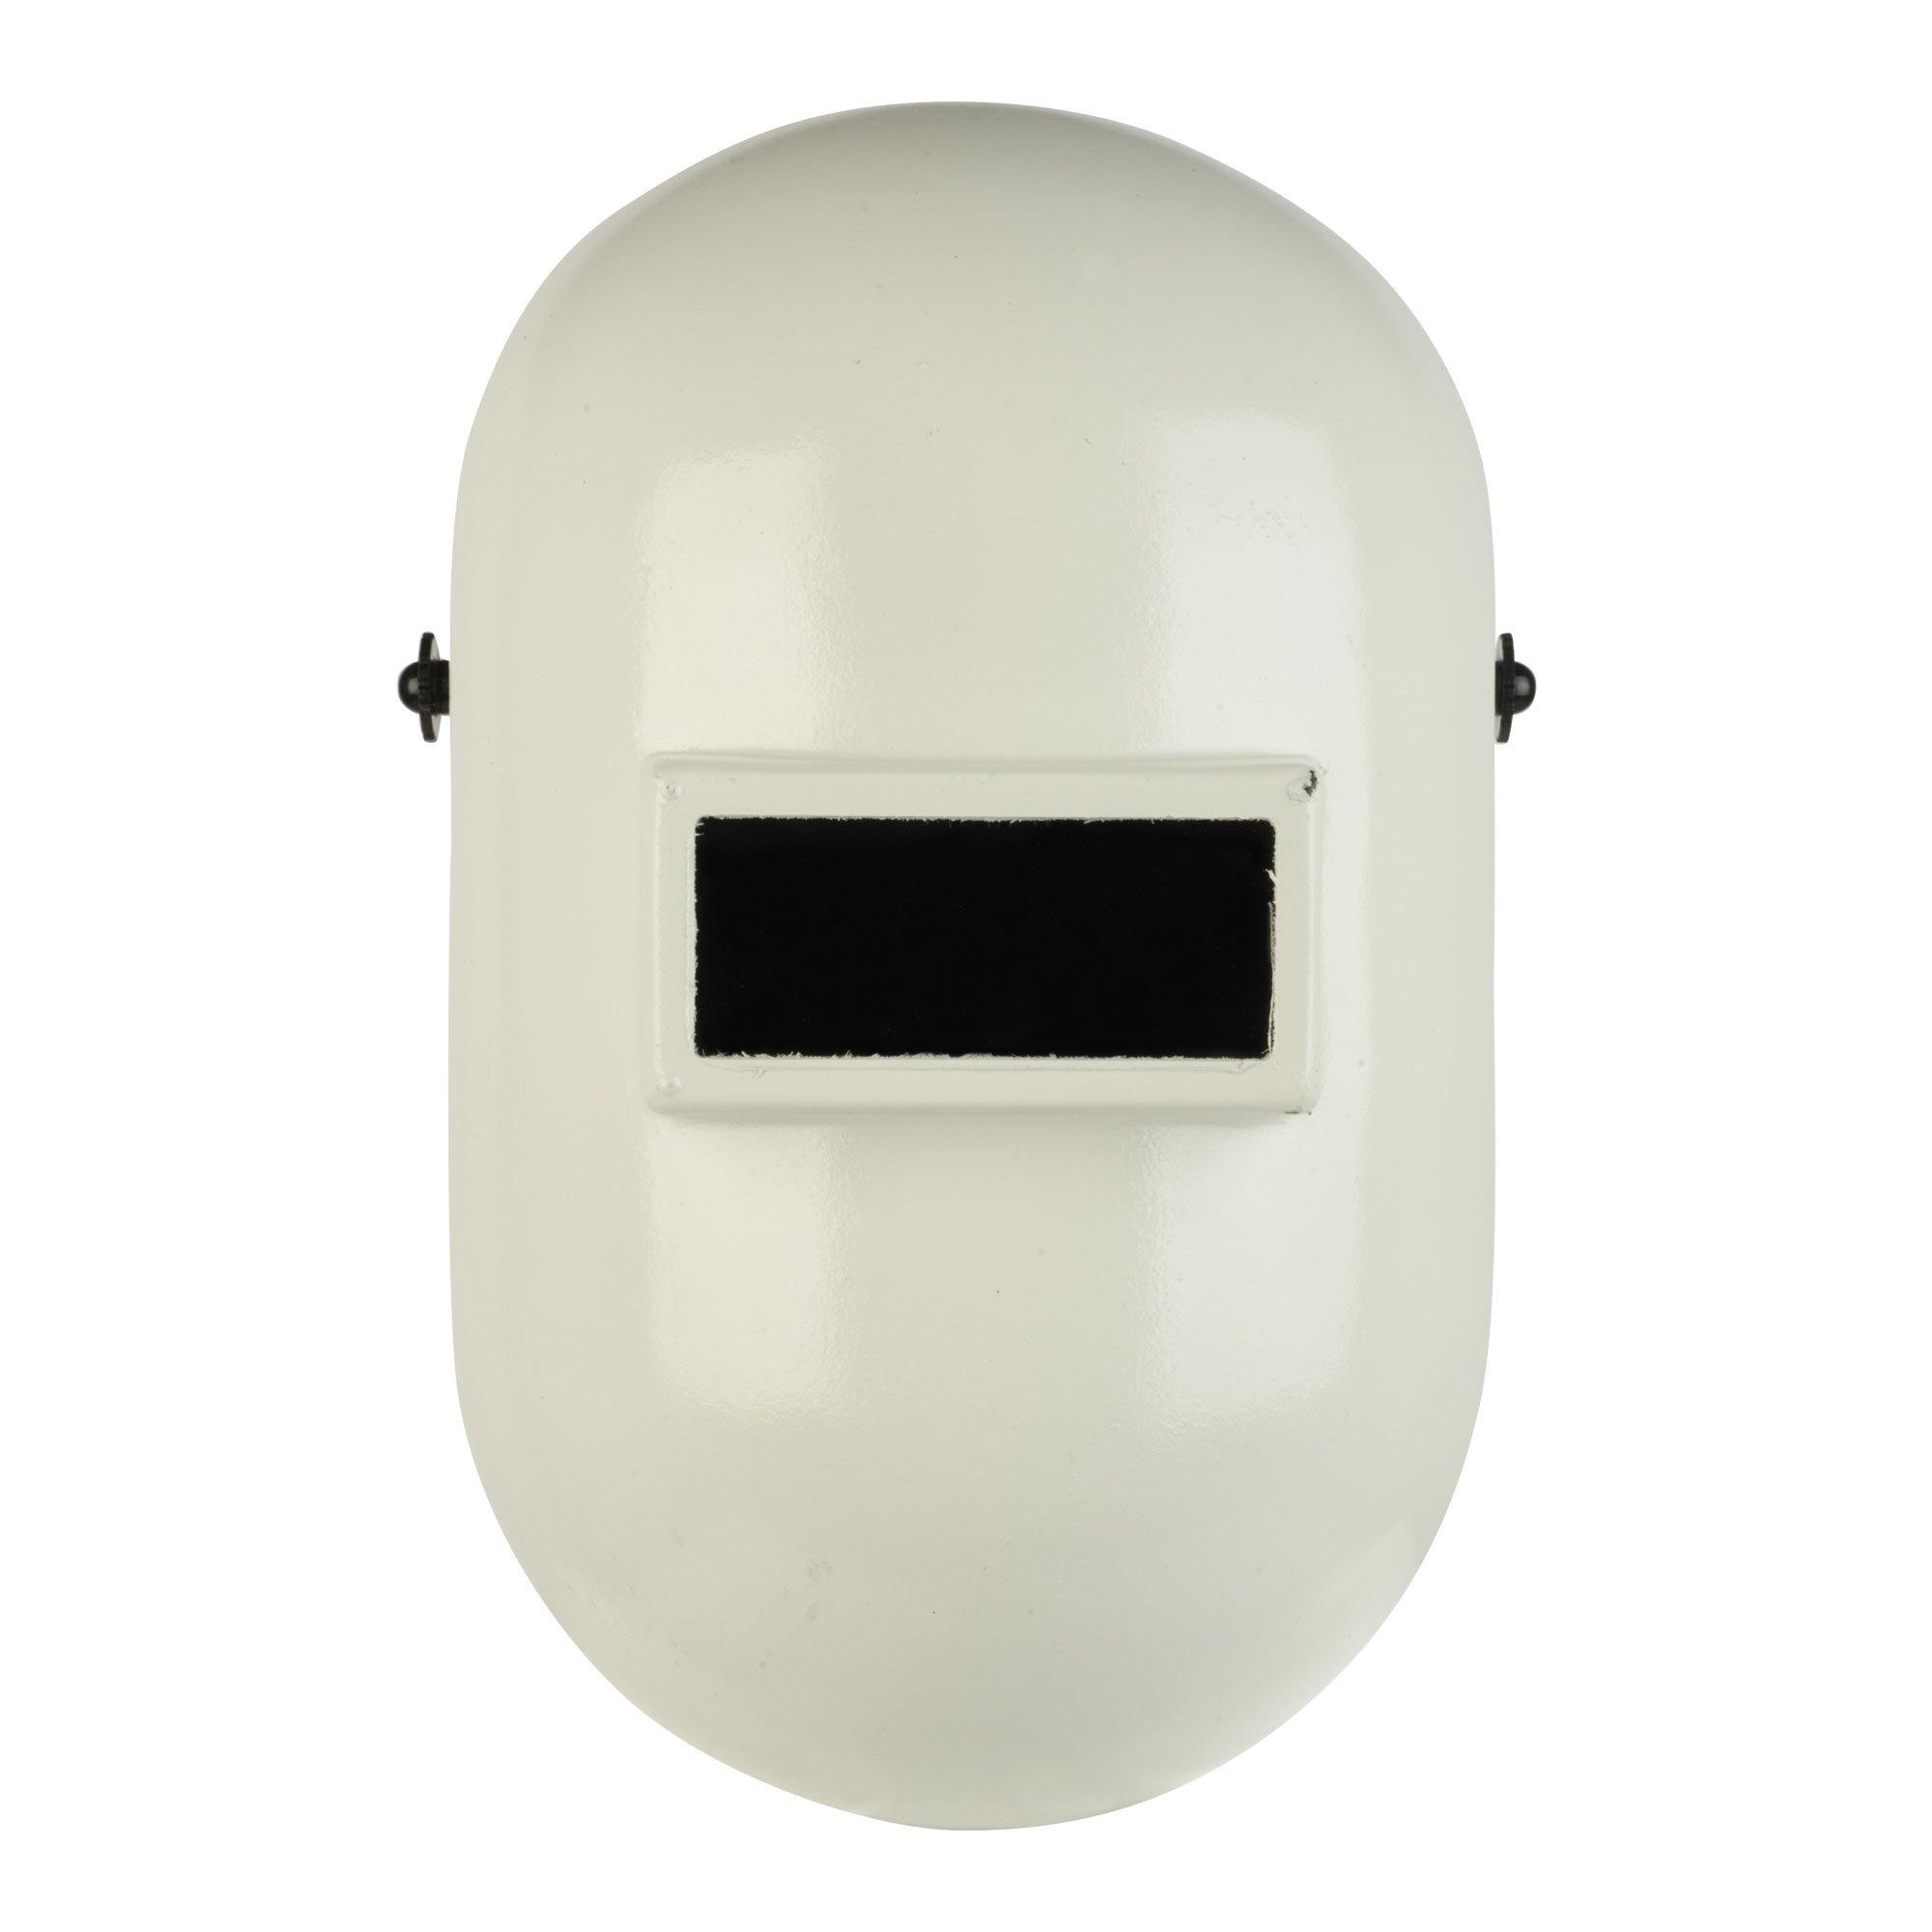 Fibre-Metal Pipeliner Fiberglass Welding Helmet with Ratchet Headgear (110WH) by Honeywell